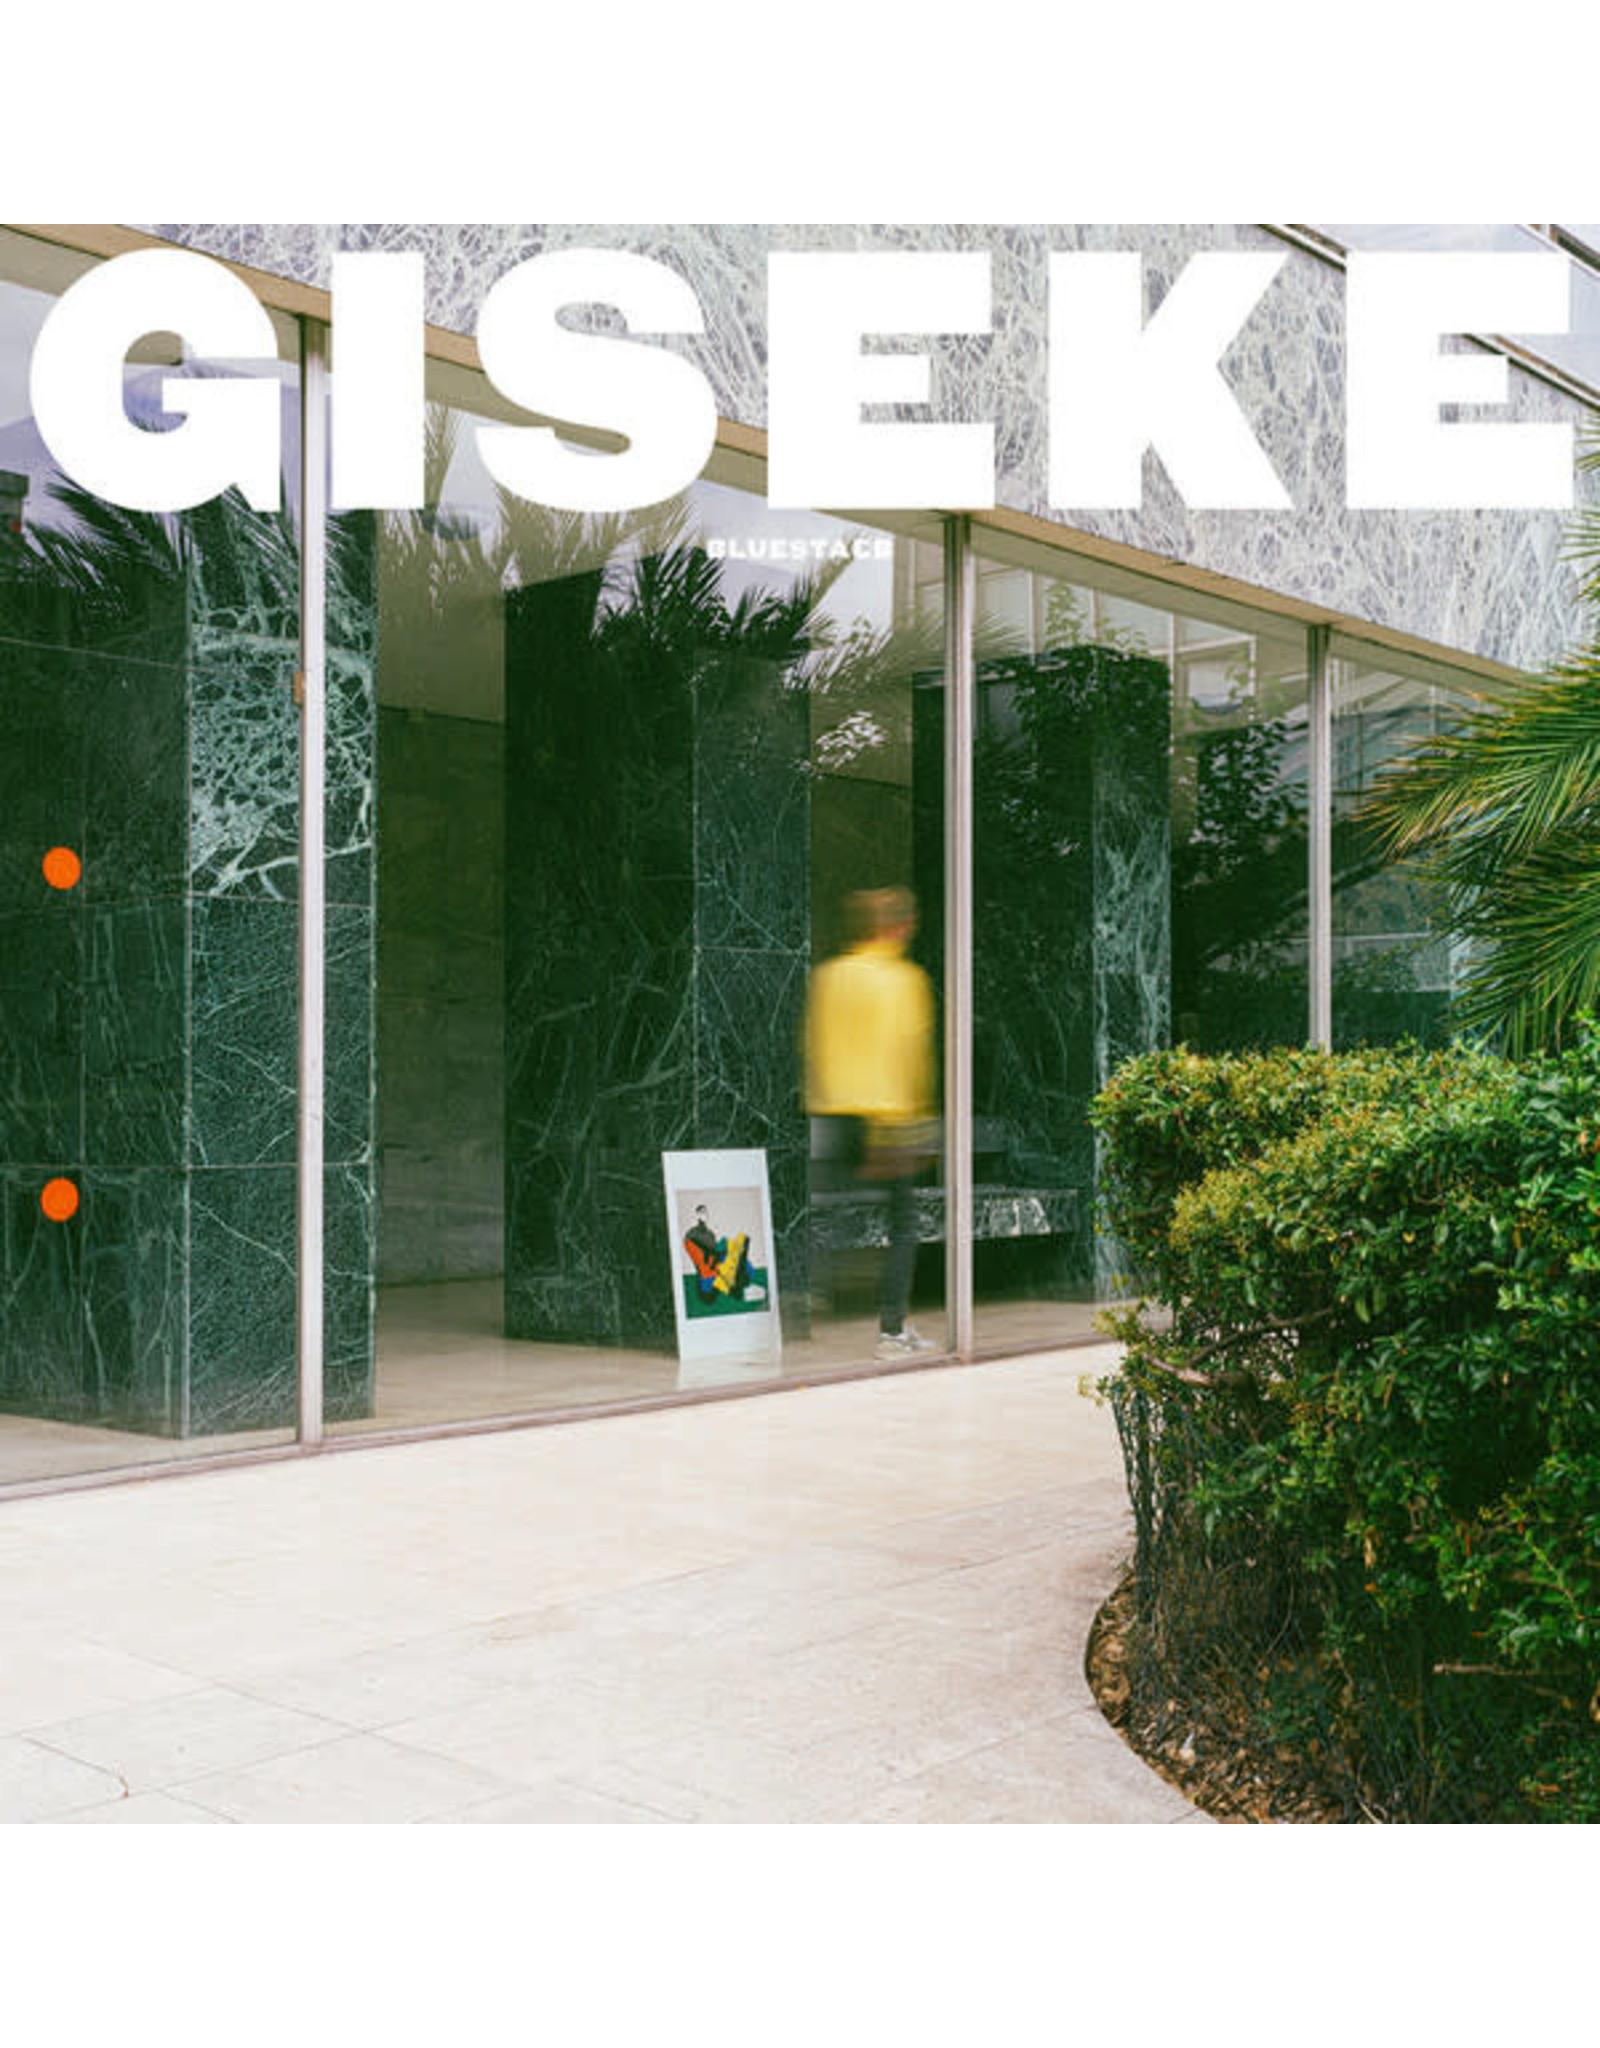 New Vinyl Bluestaeb - GISEKE LP